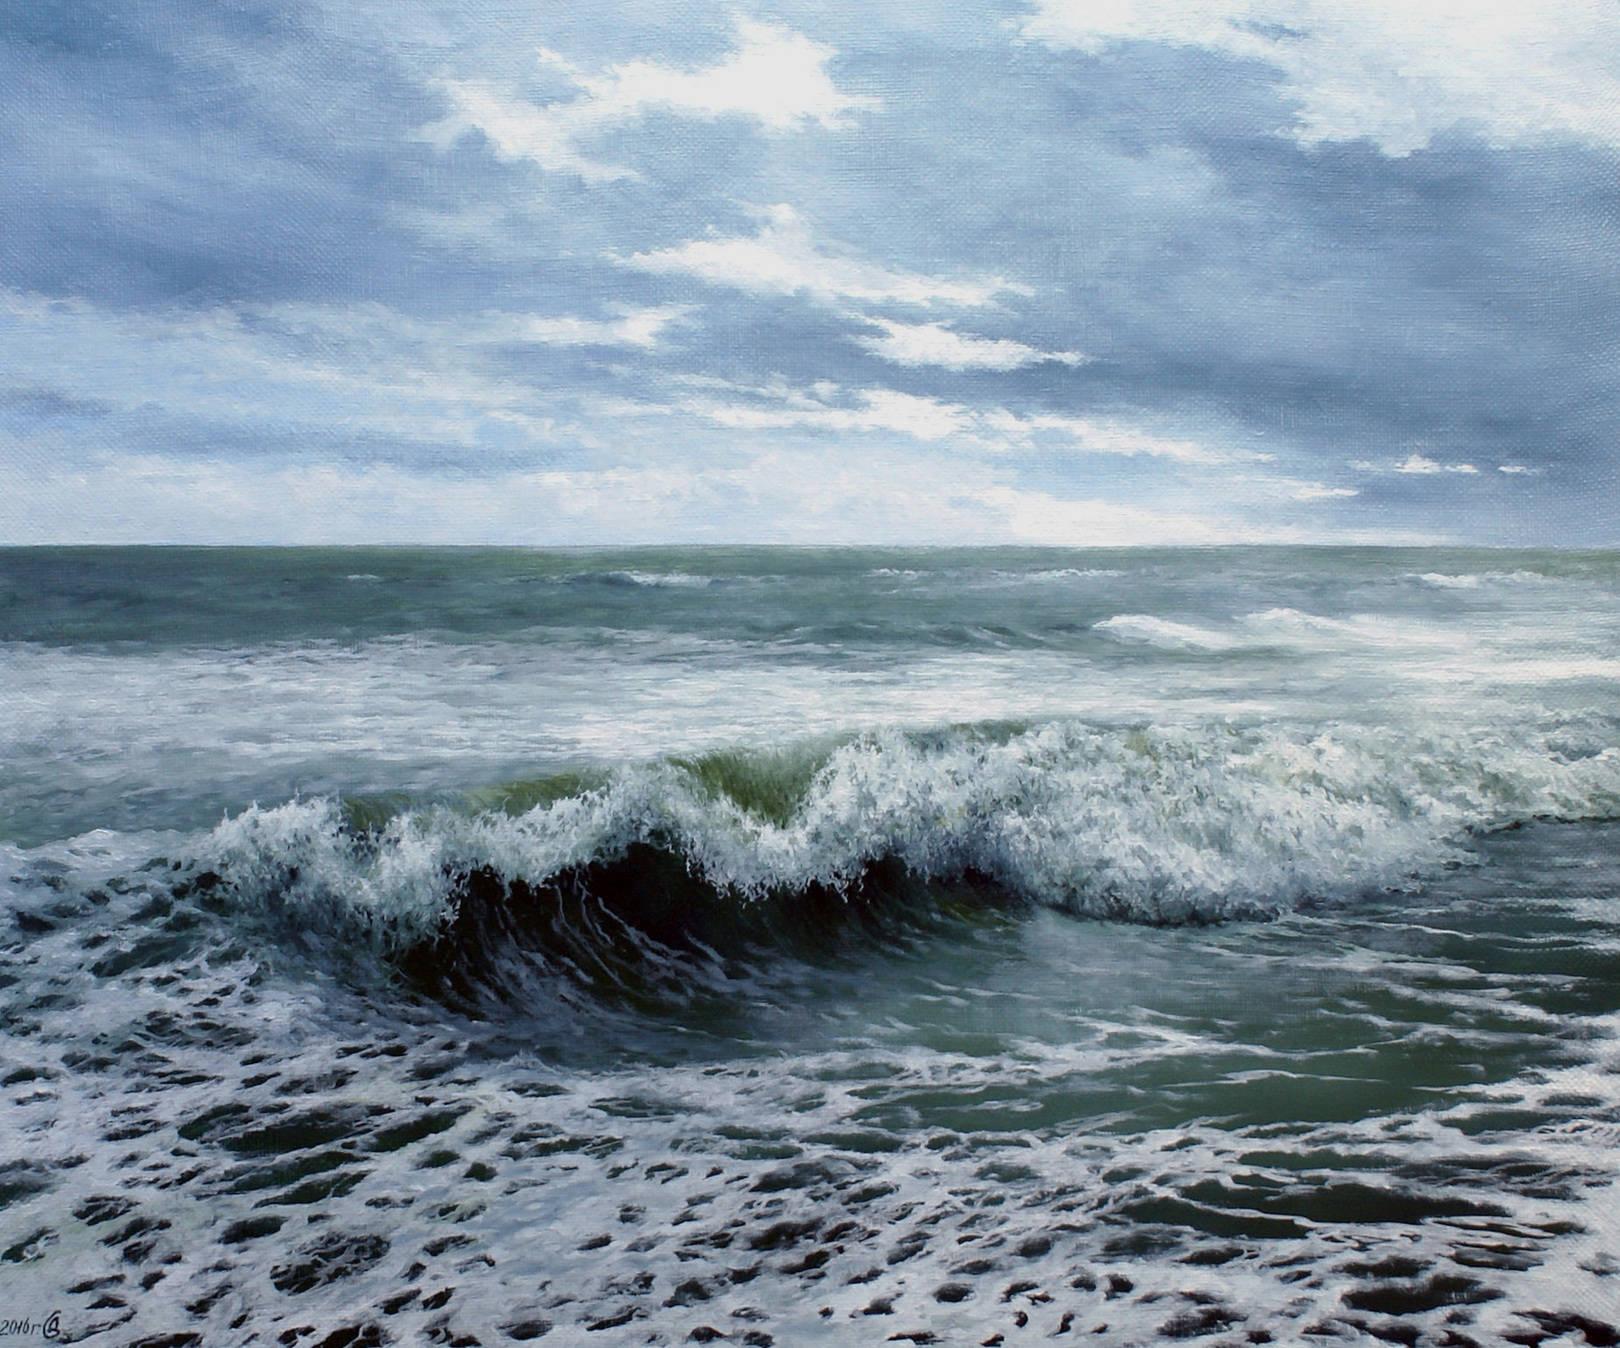 О море, море... - холст/масло, 50х60, 2016